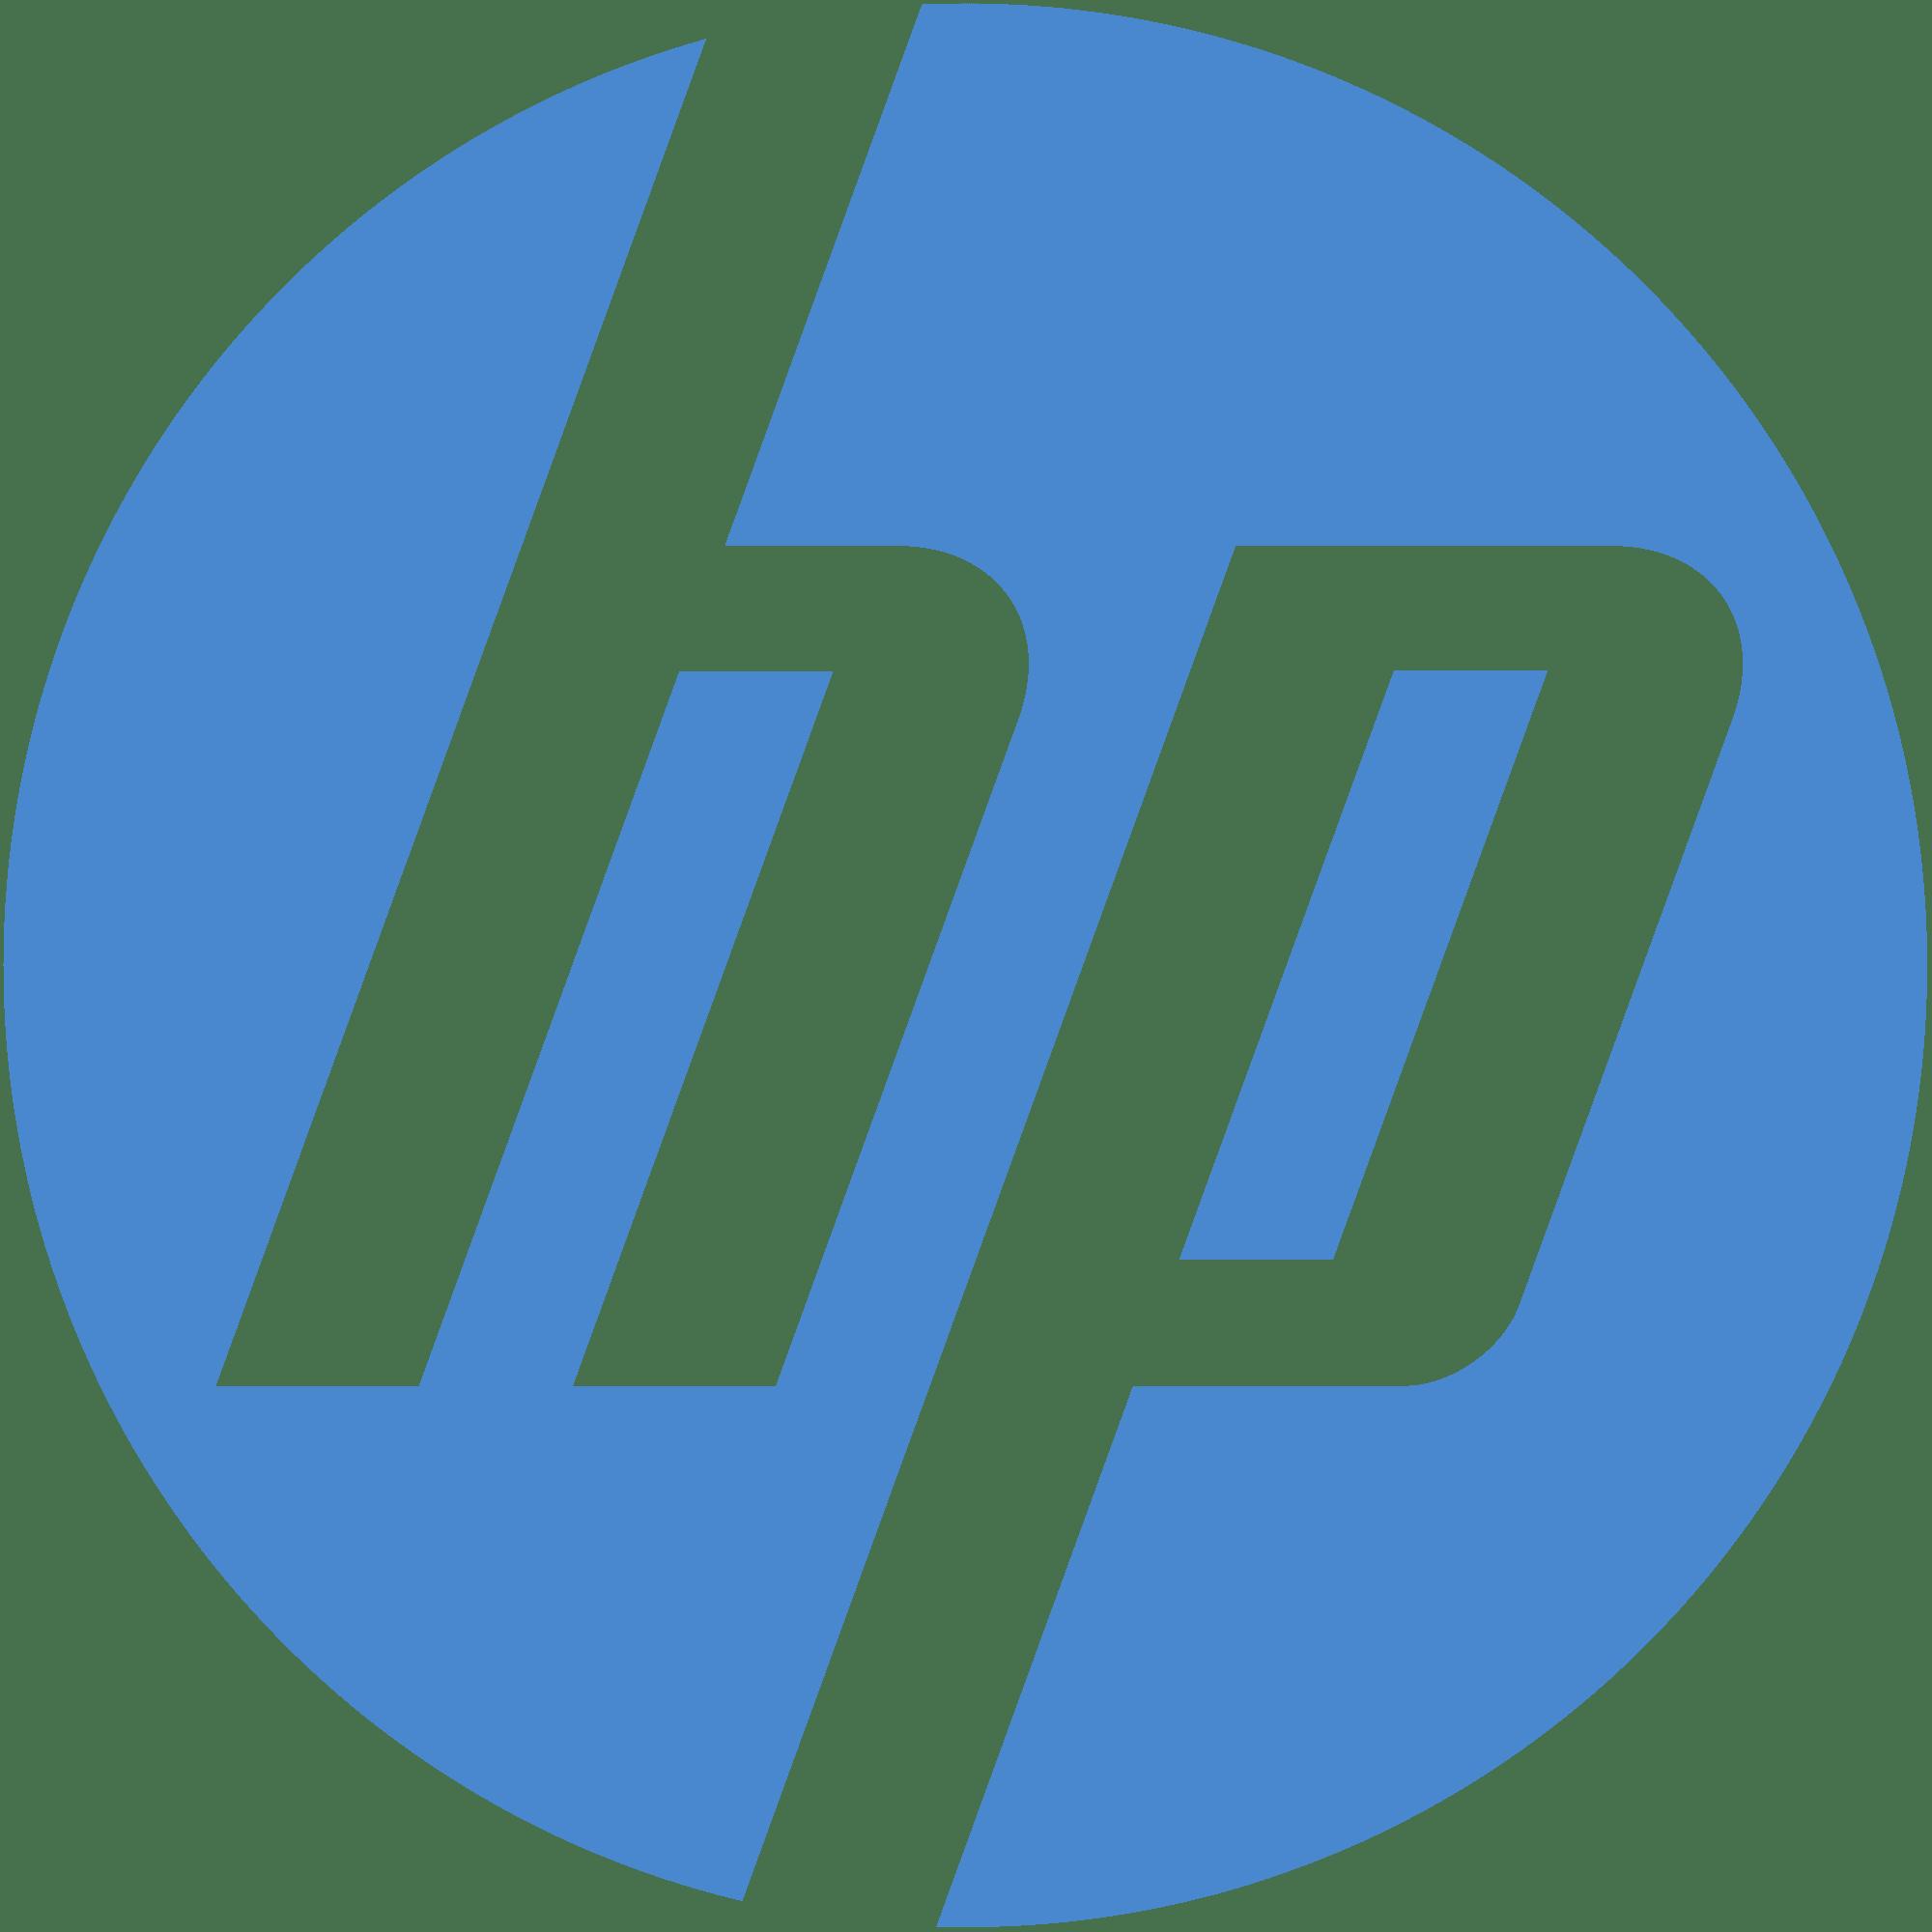 HP 2311x 23-inch Diagonal LED Monitor drivers